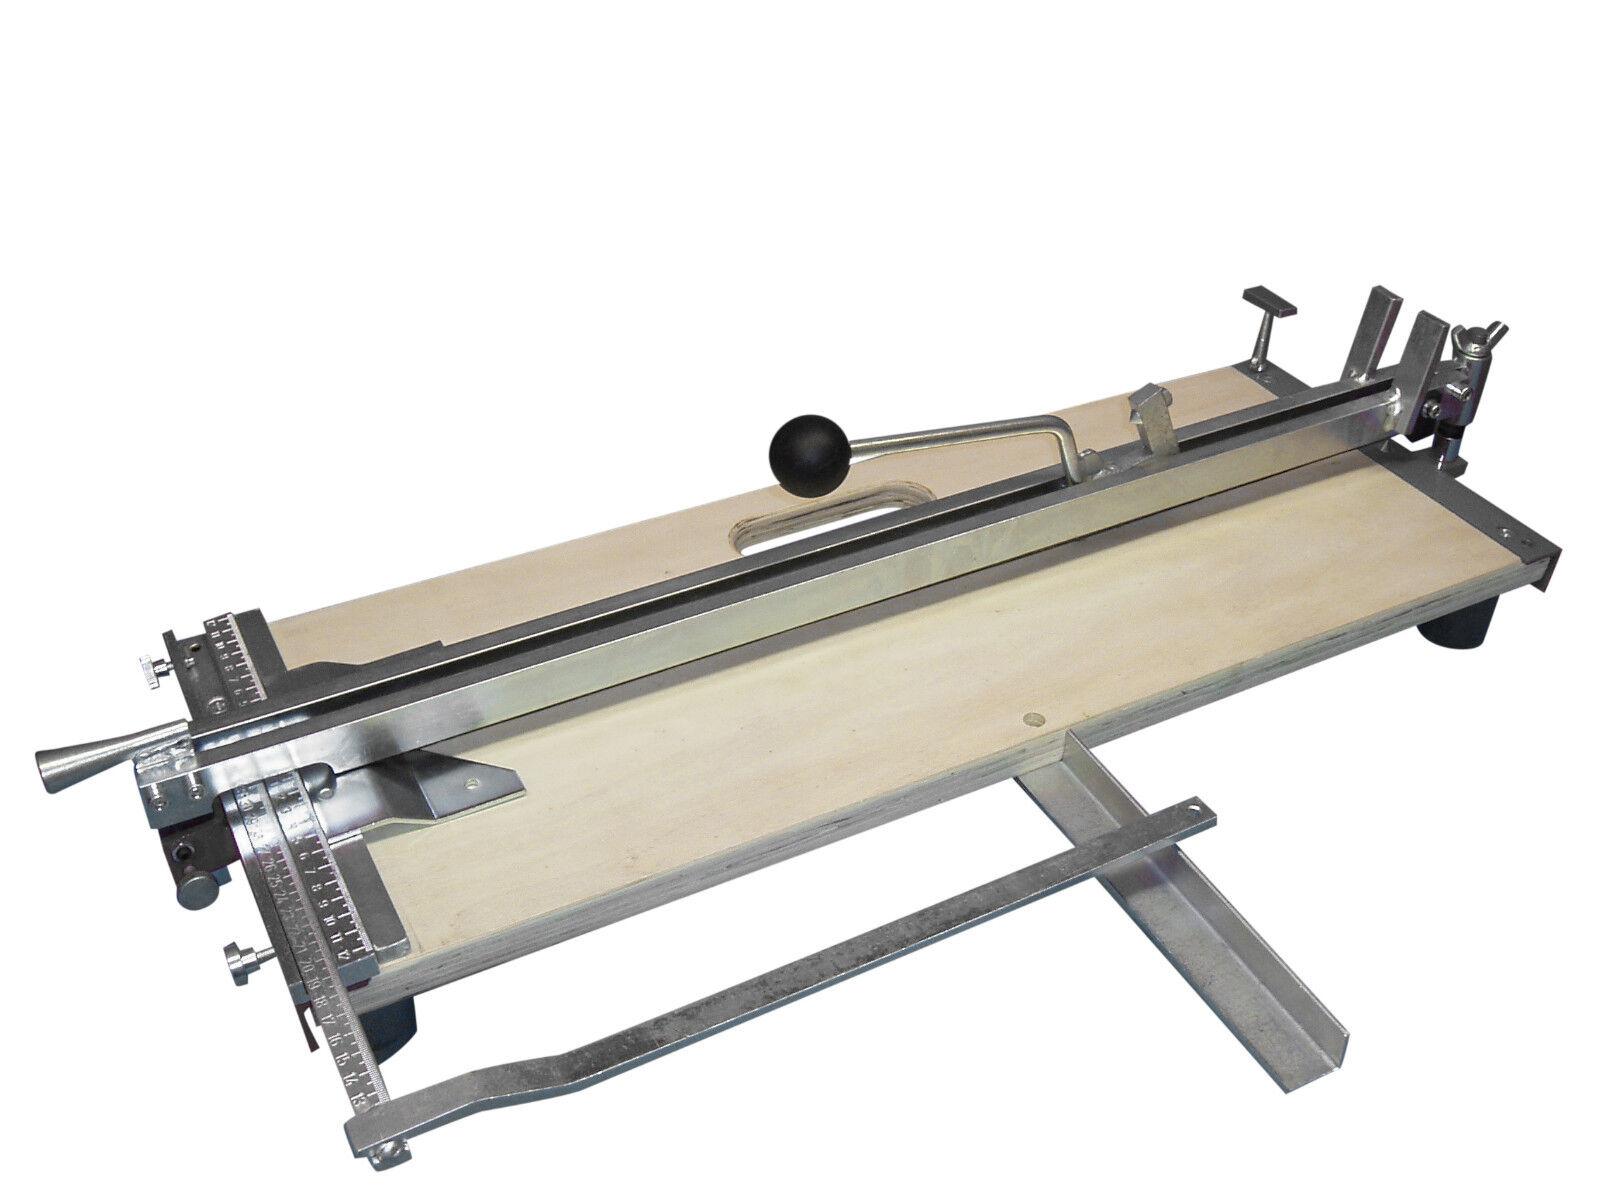 profi fliesenschneidemaschine fliesenschneider 610 mm. Black Bedroom Furniture Sets. Home Design Ideas